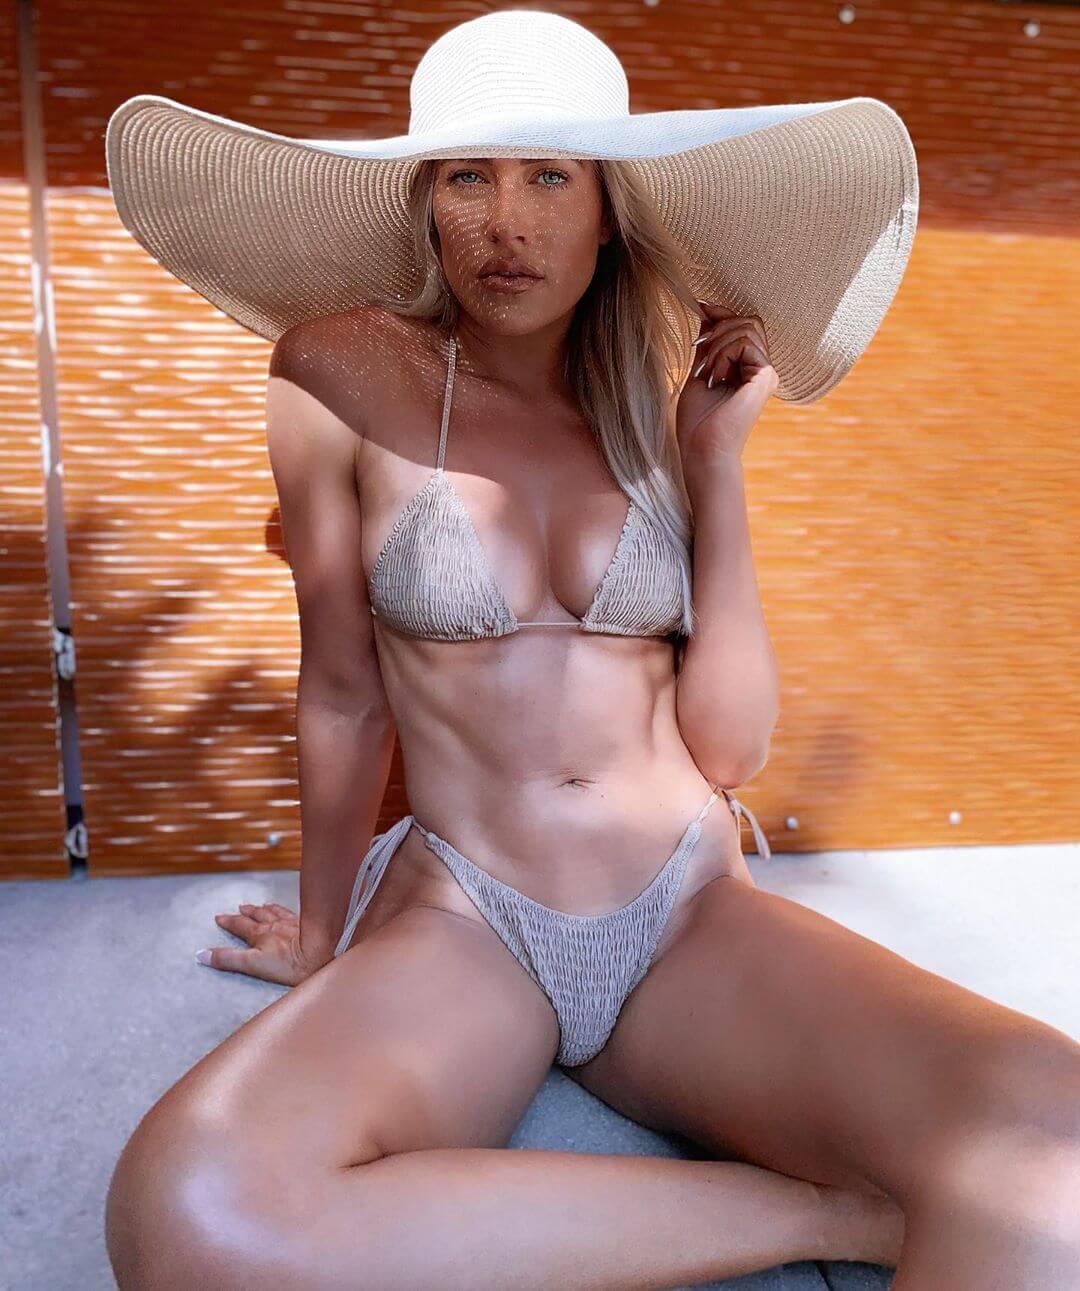 Kelly Kelly bikini